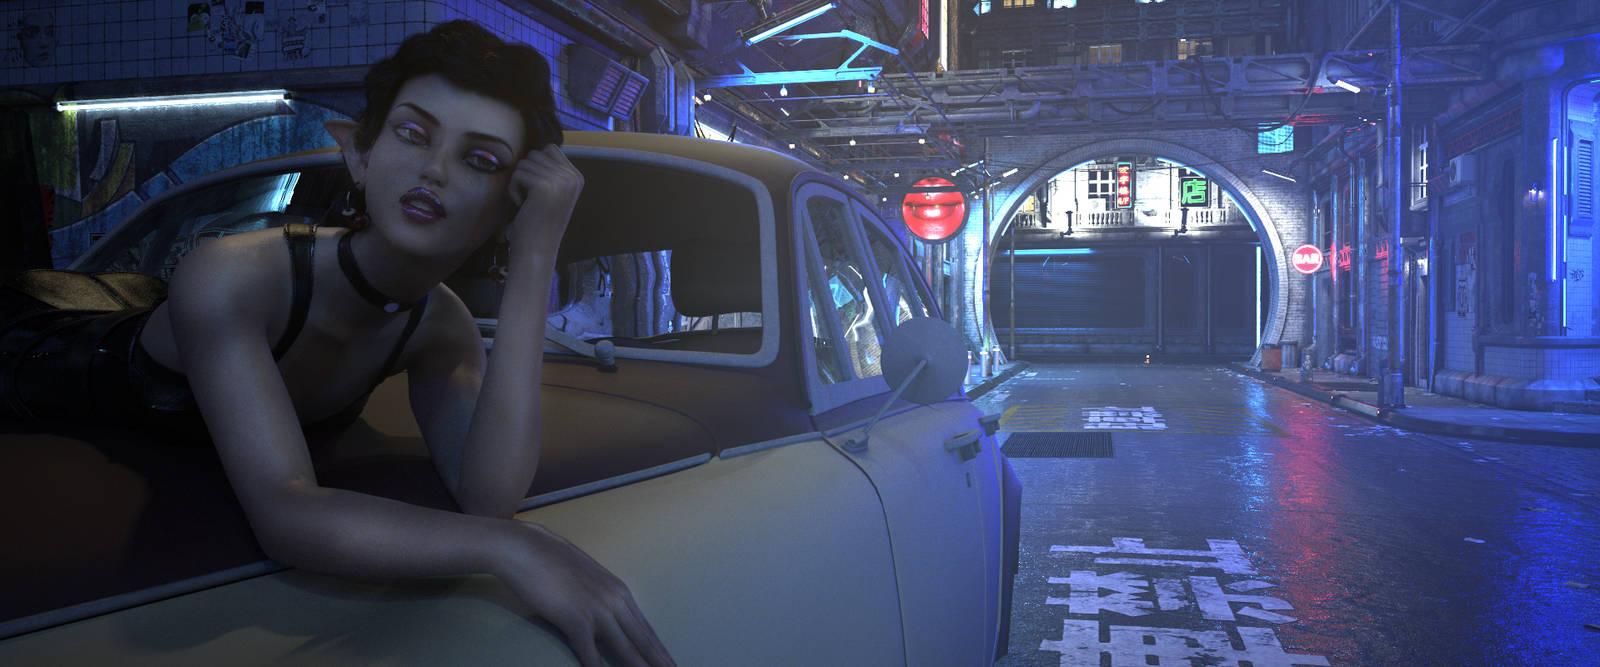 Cyberpunk City at Night